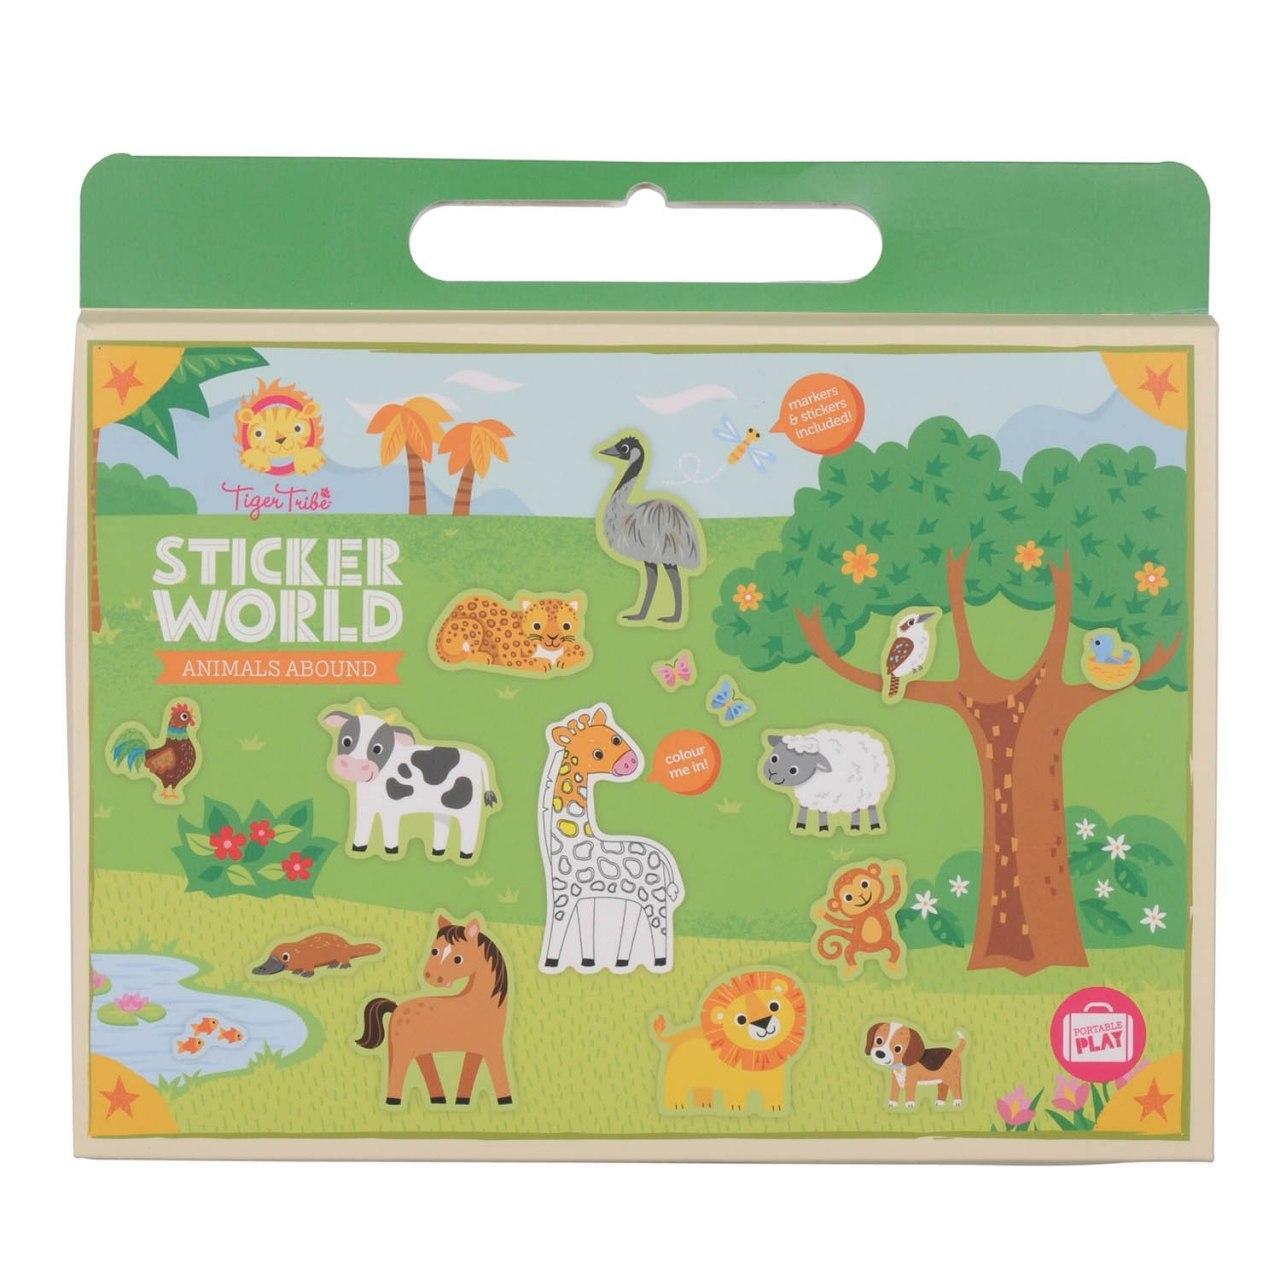 Купить Набор для творчества TIGER TRIBE 6-0223 Царство животных, Китай